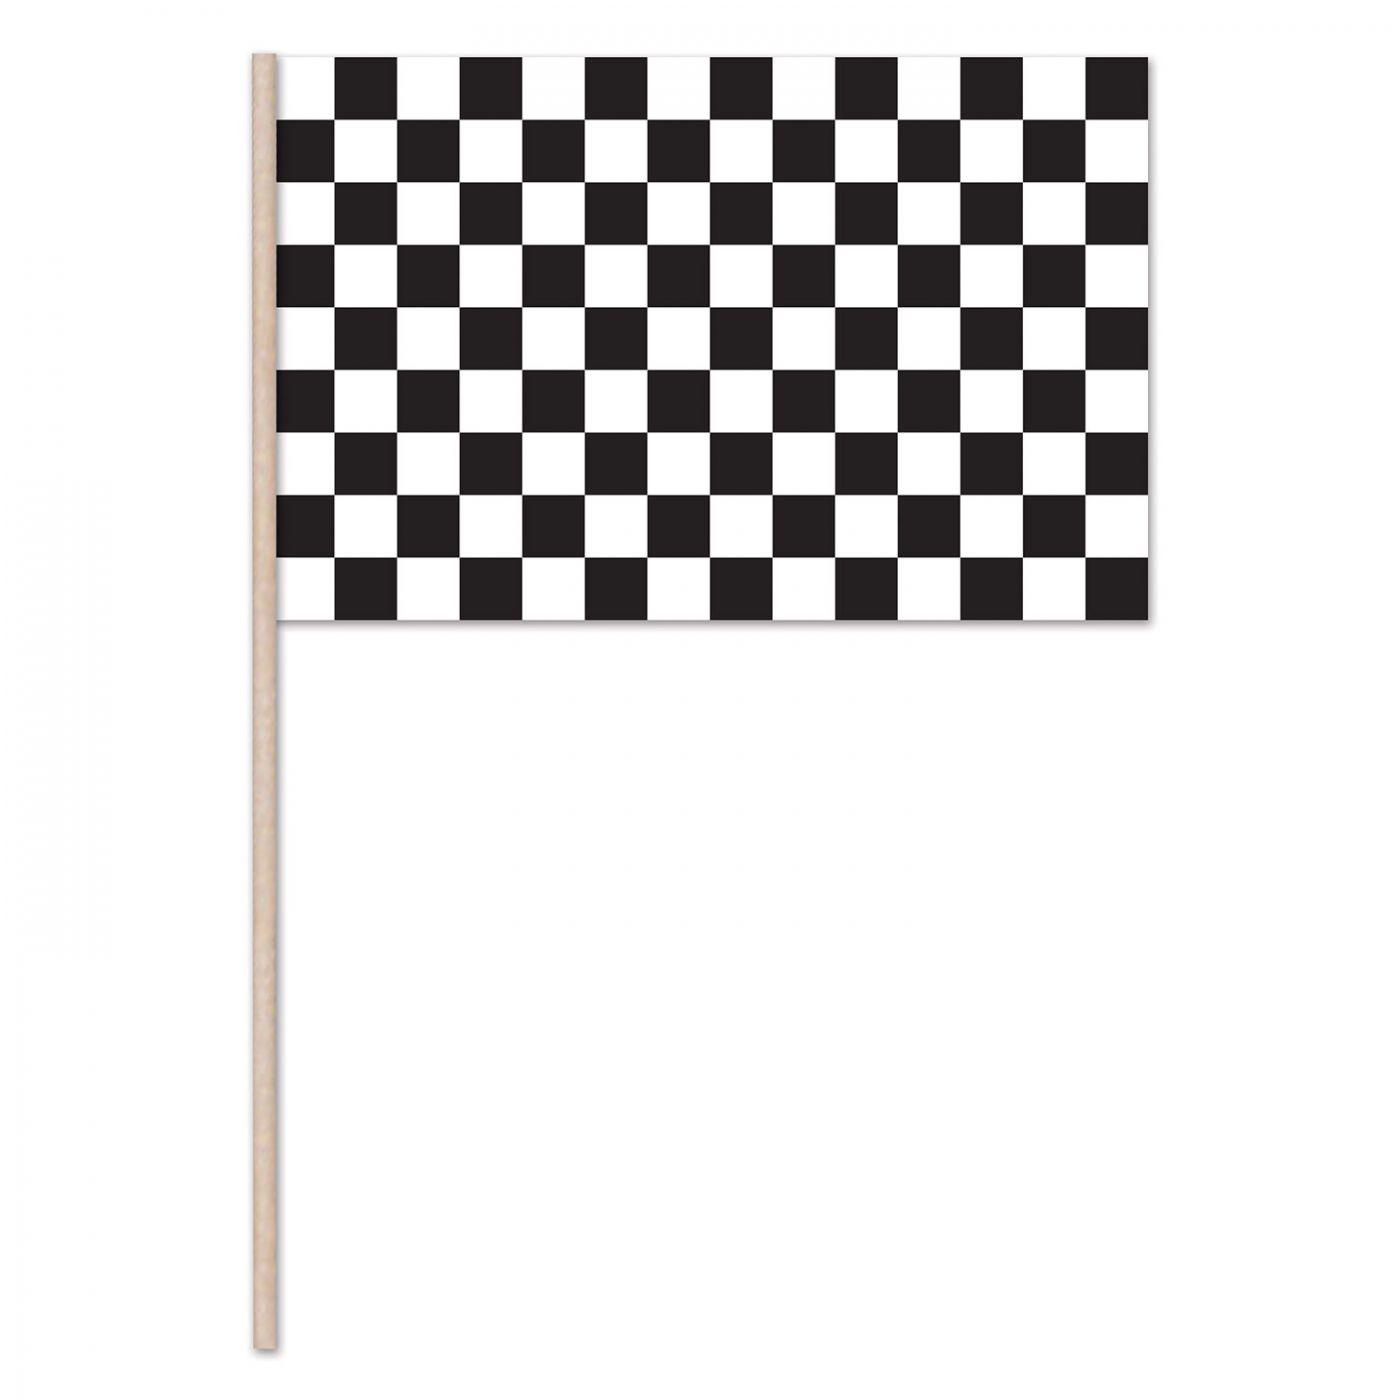 Checkered Flag - Plastic (144) image